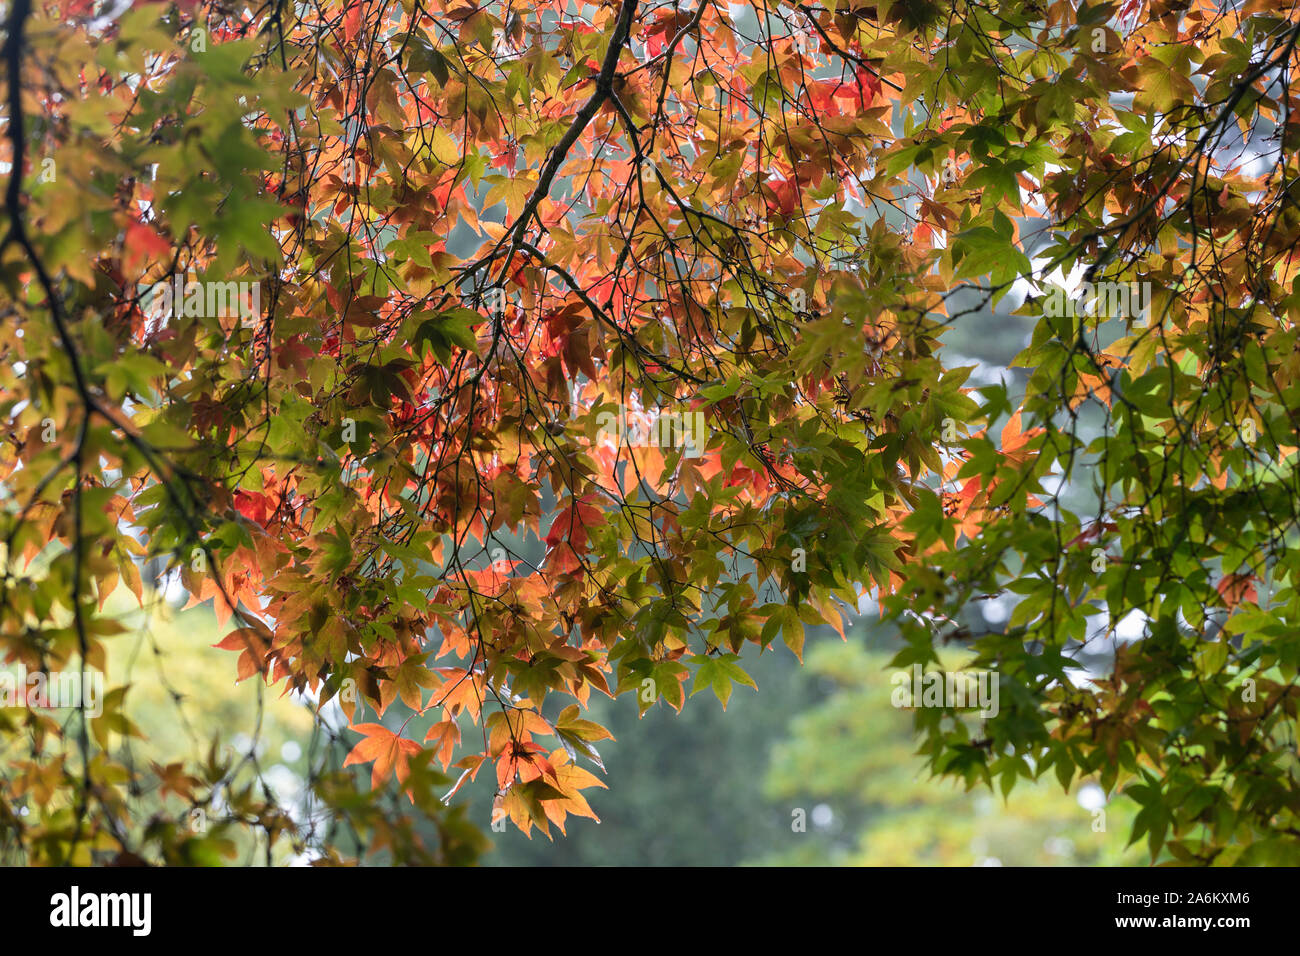 Sunlit autumn leaves of the Japanese Maple Acer Palmatum at Westonbirt Arboretum, Gloucestershire, England, UK Stock Photo